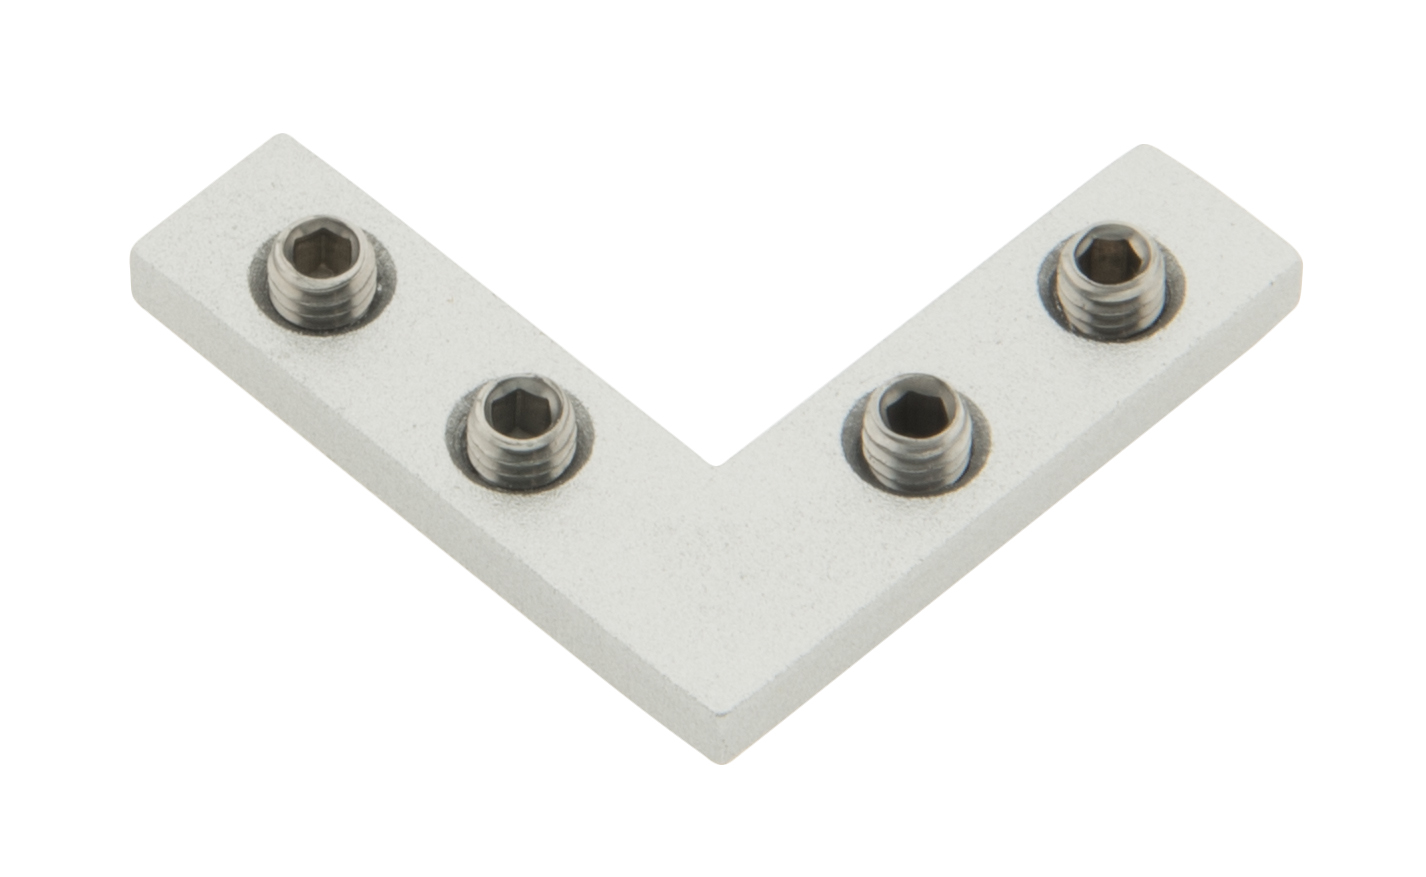 1 Stk Eck Profilverbinder SLR LIPZ004004